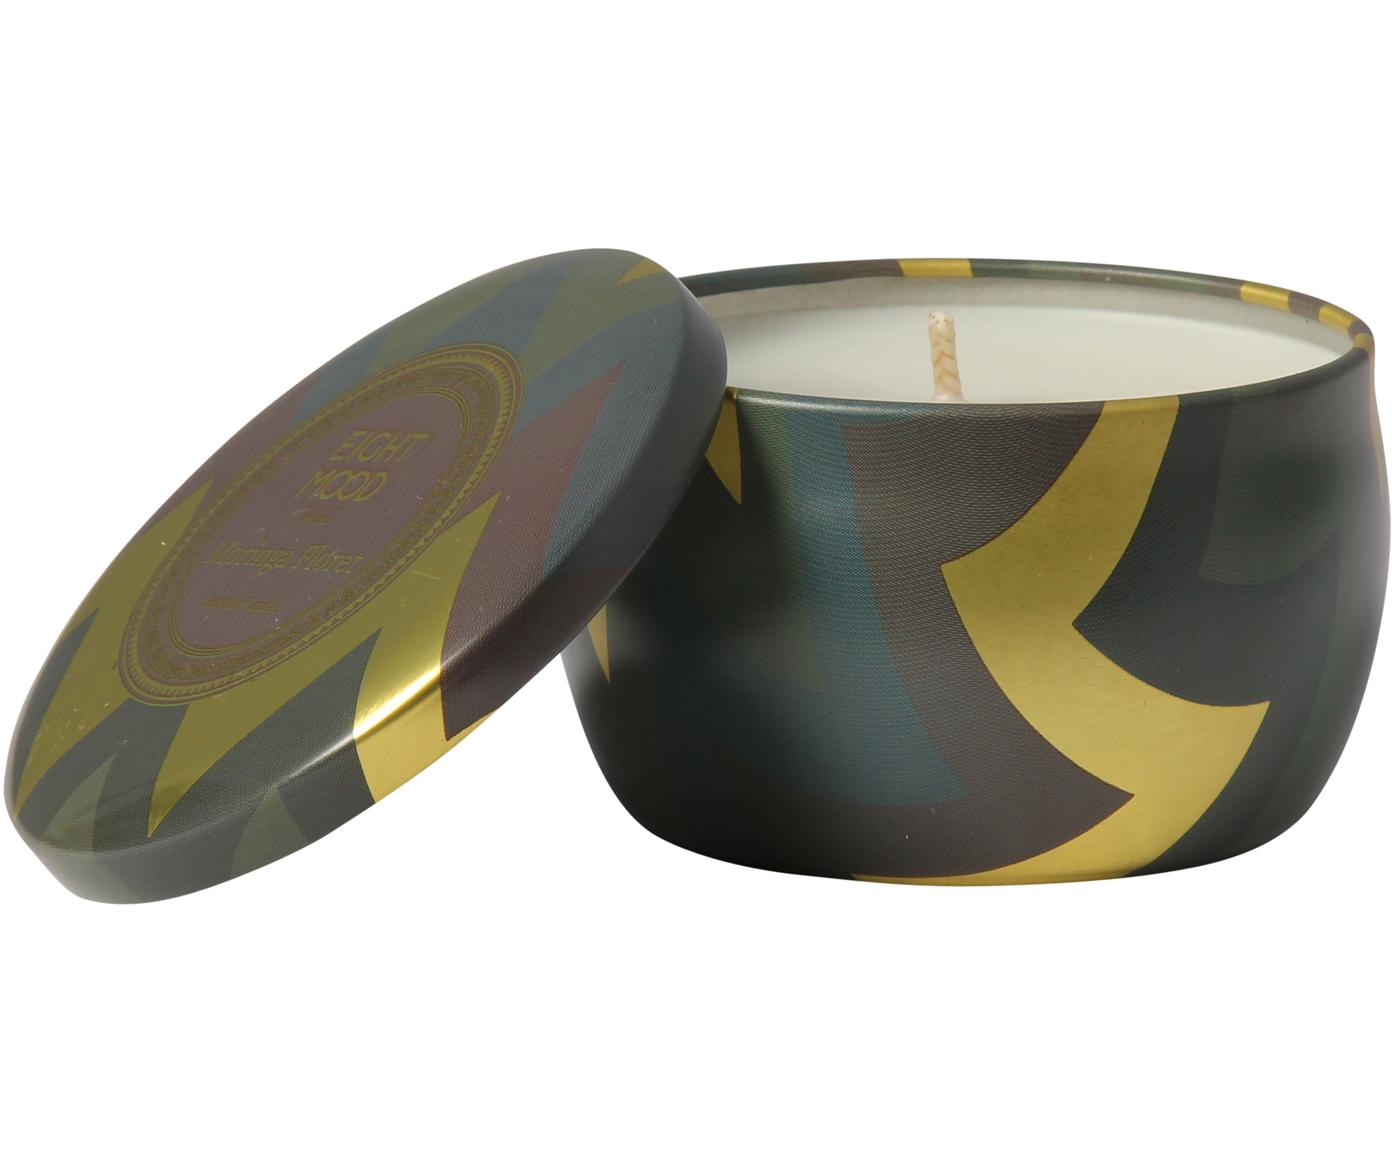 Duftkerze Hanneke (Pfirsich, Bergamotte & Melone), Behälter: Metall, Goldfarben, Braun, Grün, Ø 8 x H 5 cm